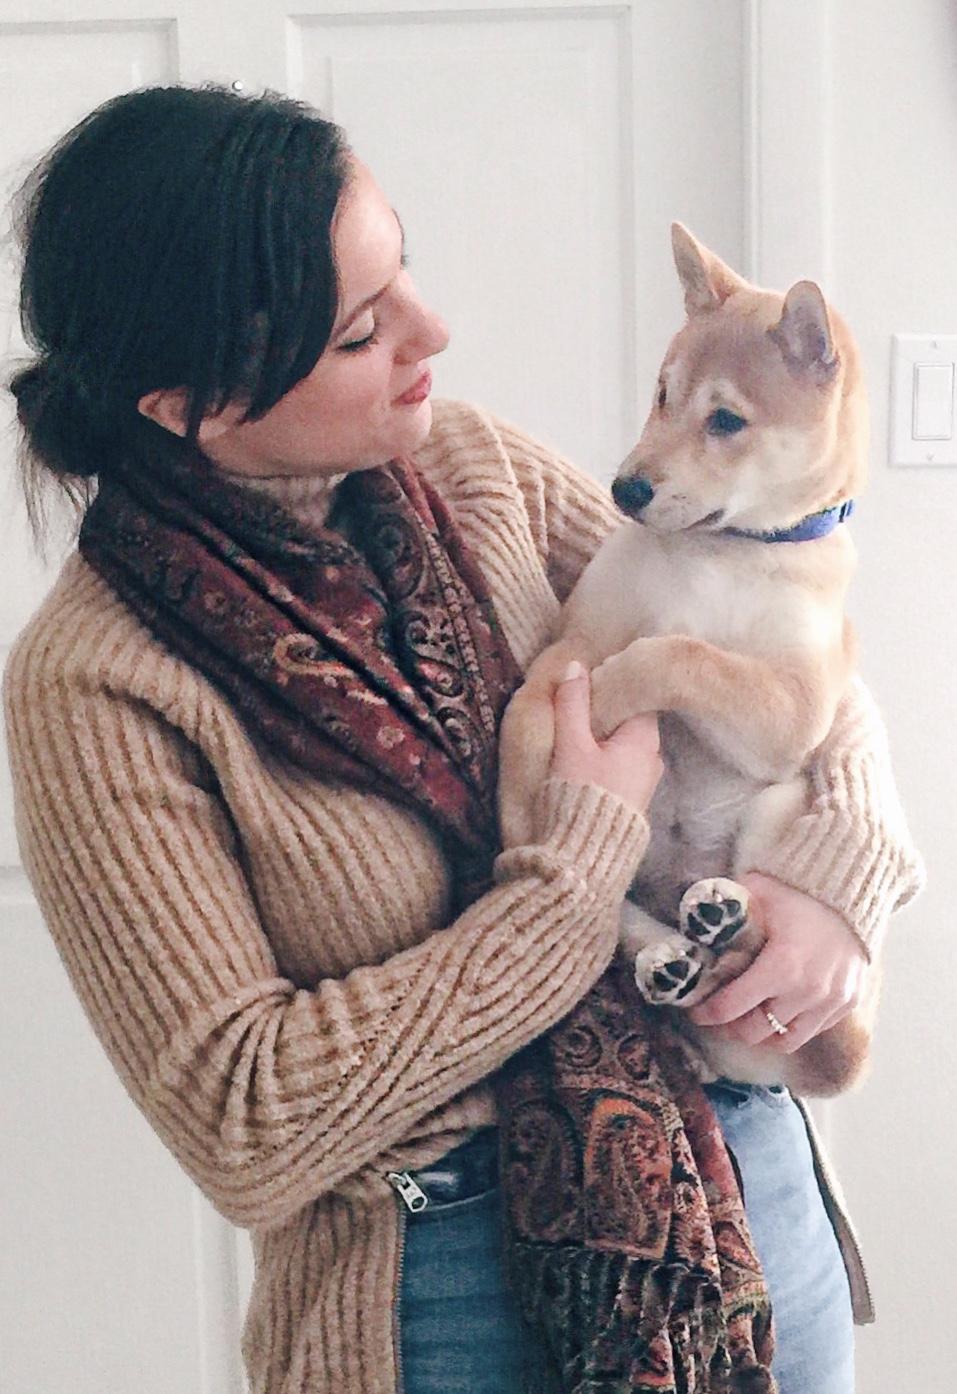 new puppy, Shiba Inu, shiba inu puppy, choosing a dog, choosing a puppy, fur baby, dog-friendly miami, Miami dogs, Kenji the Shiba